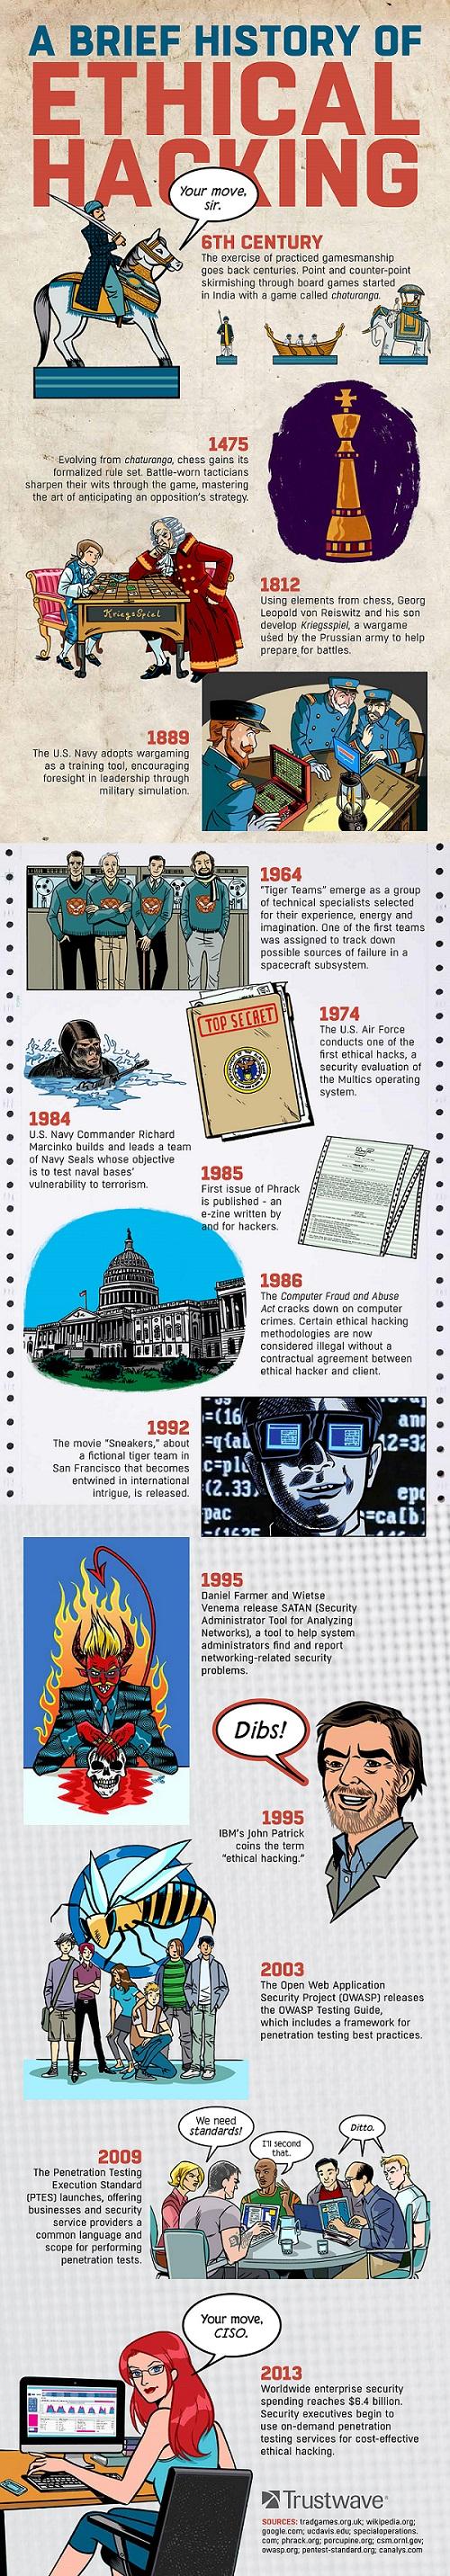 Historia del hacking ético